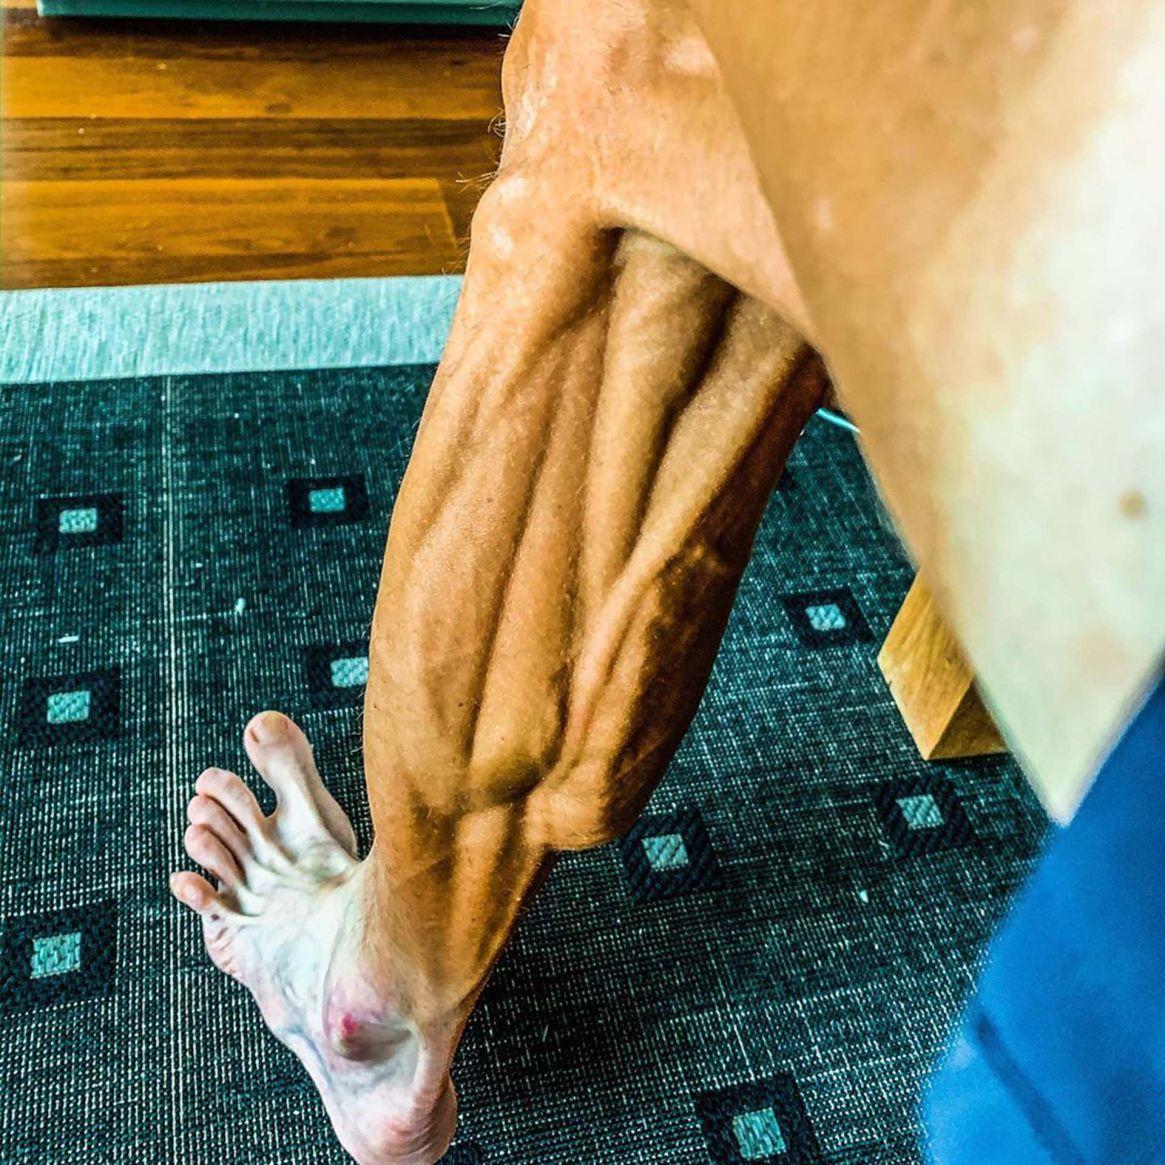 Así se ve la pierna de Brajkovic luego de competir